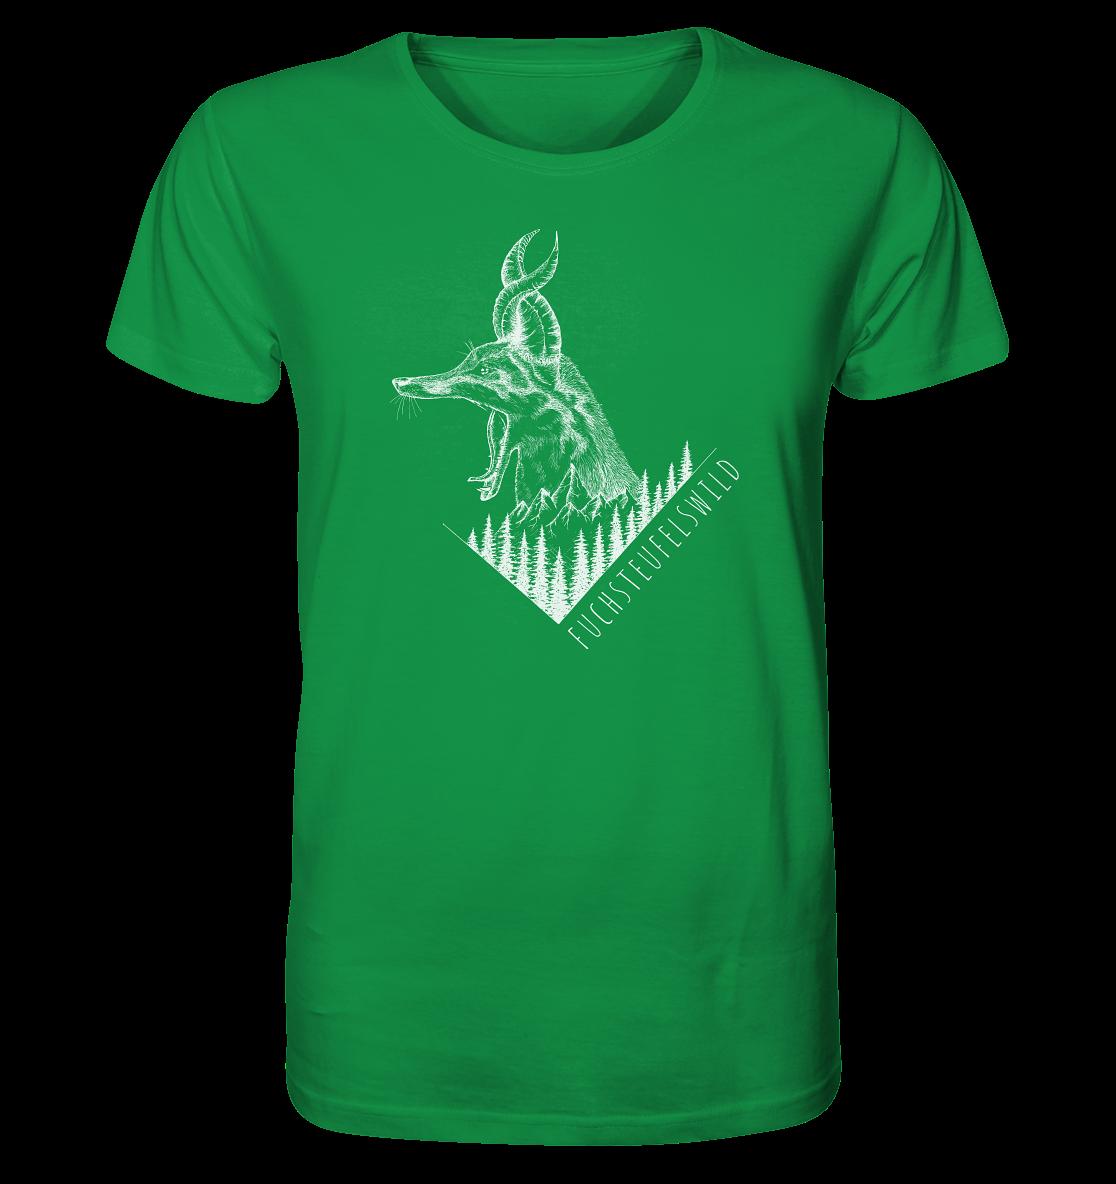 front-organic-shirt-149348-1116x-8.png